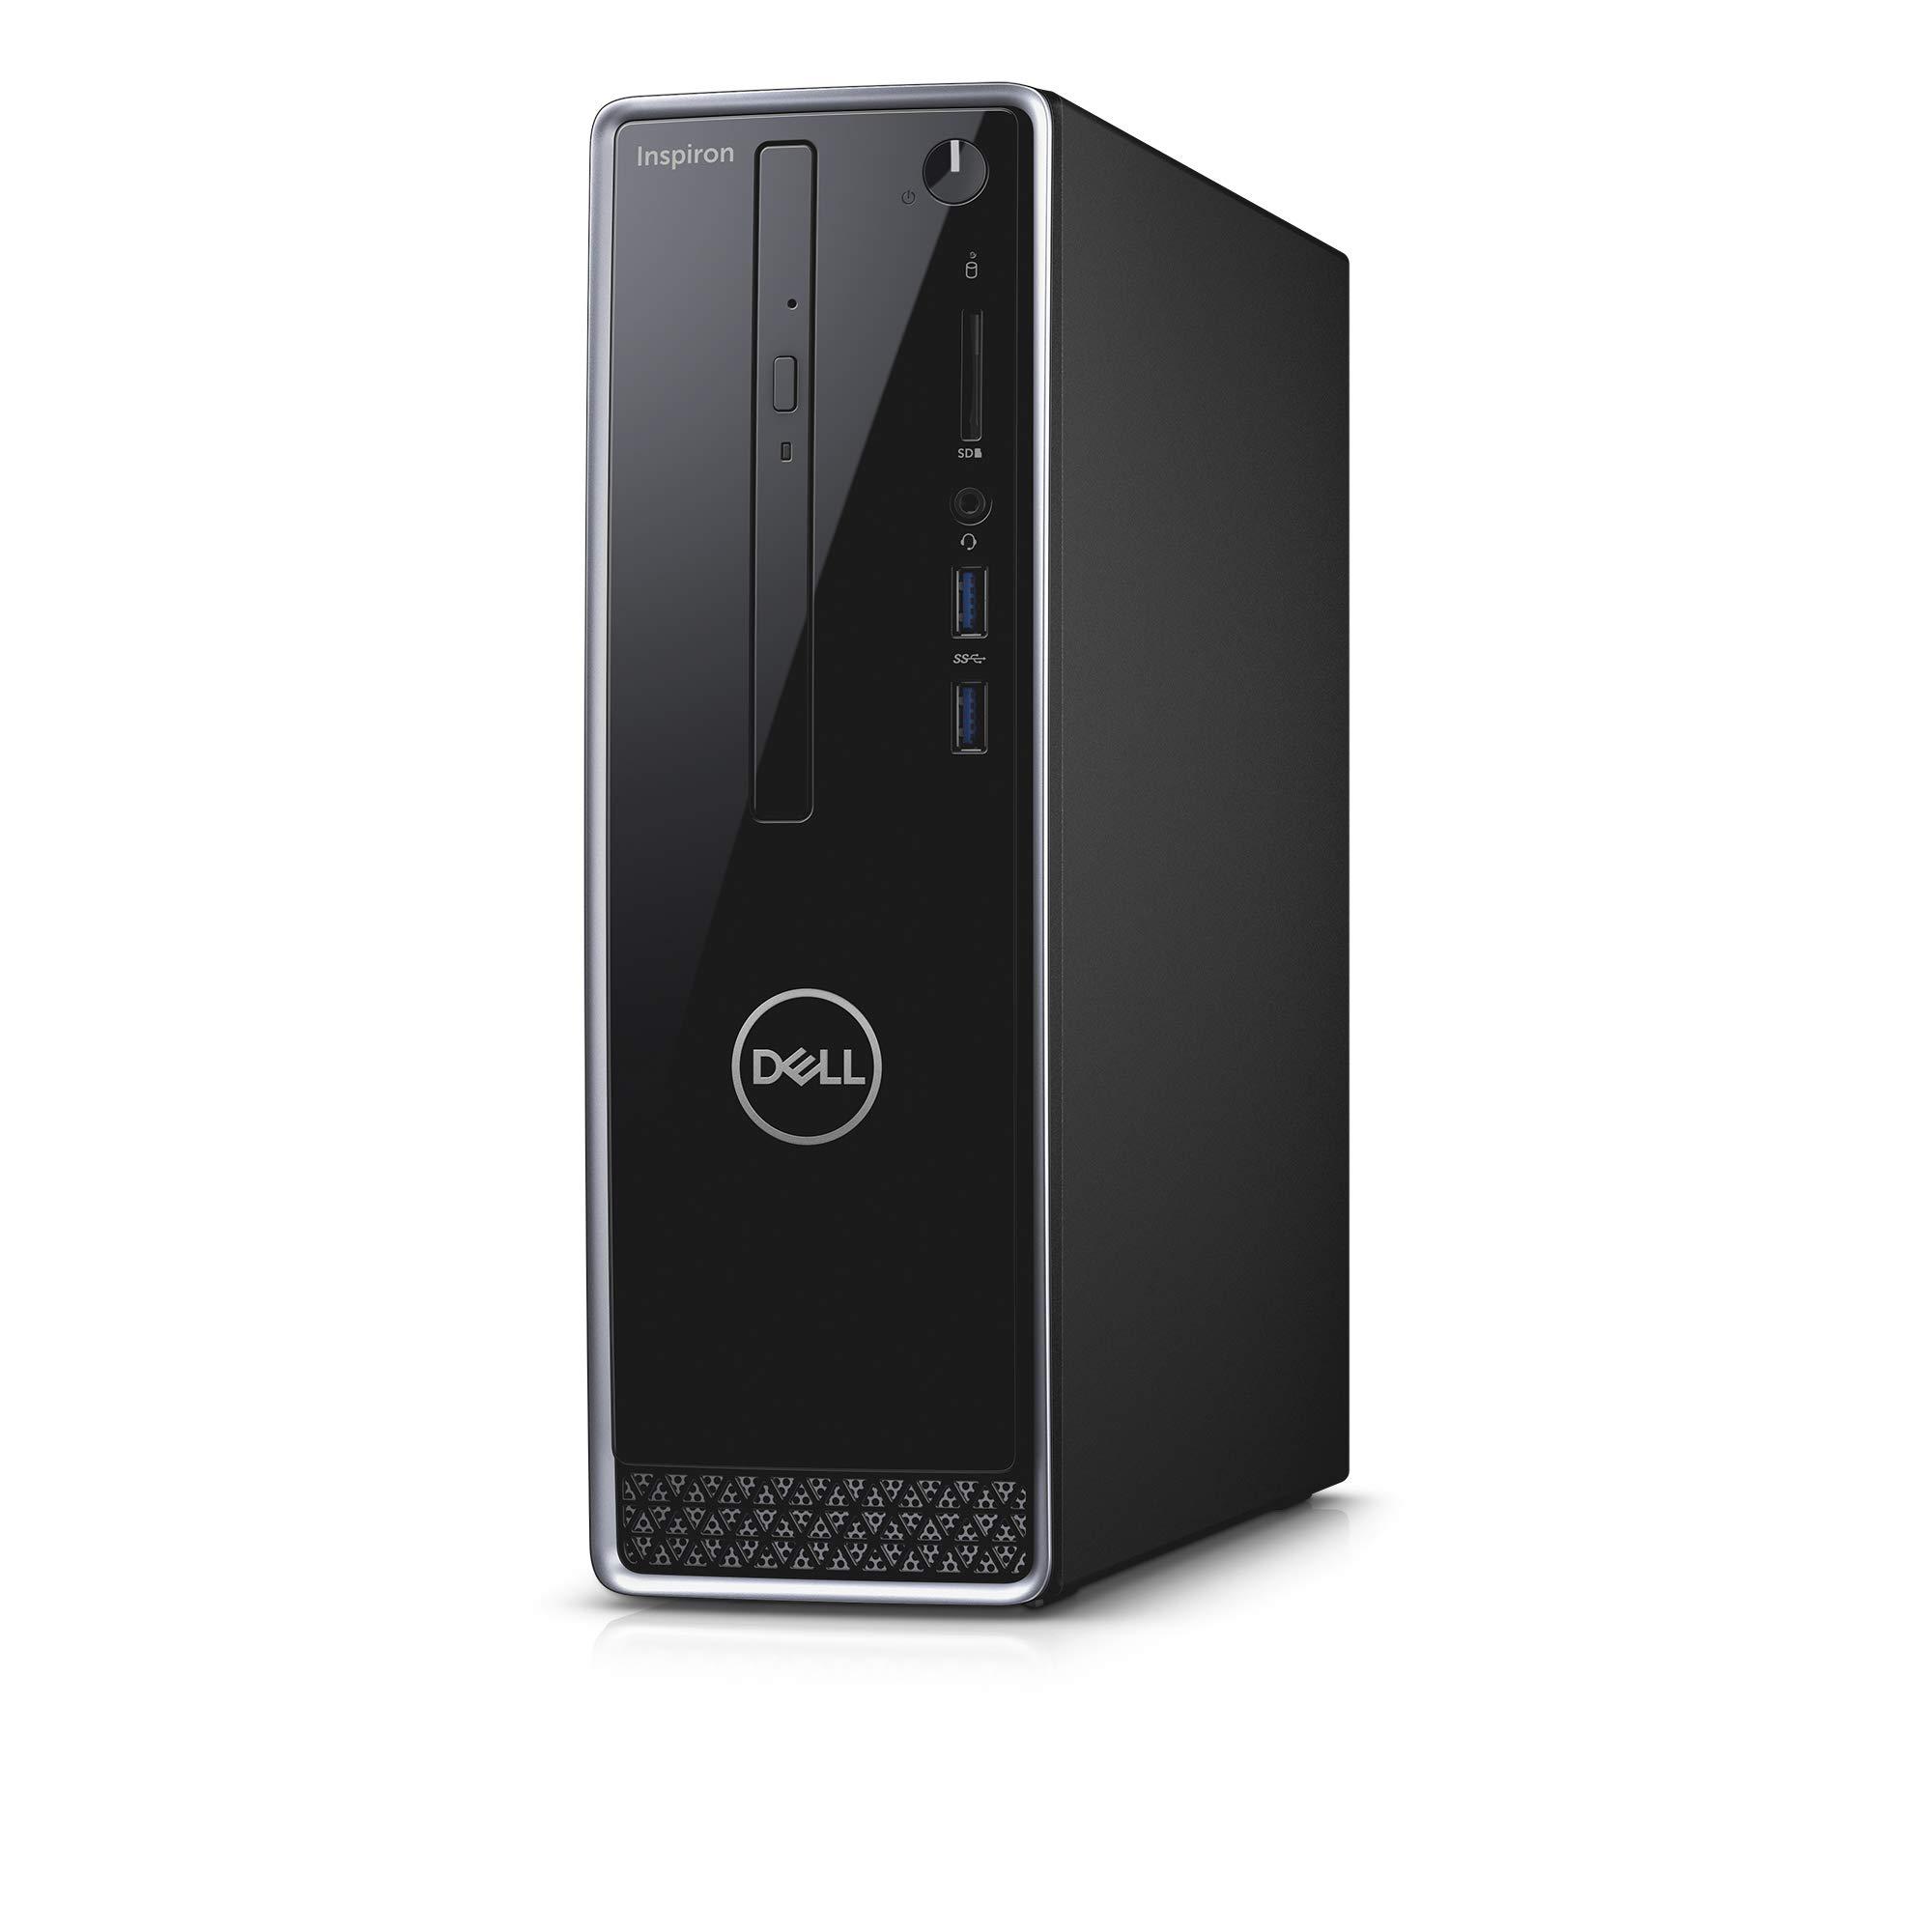 Dell Inspiron 3470 Desktop, 2 Year Onsite Warranty, Windows 10 Pro, 9th Gen Intel Core i5-9400 6-Core 4.1GHz Proc w/Intel Turbo Boost Technology, 12GB DDR4 2666MHz RAM, 1TB HDD+128Gb SATA SSD, DVD RW by Dell